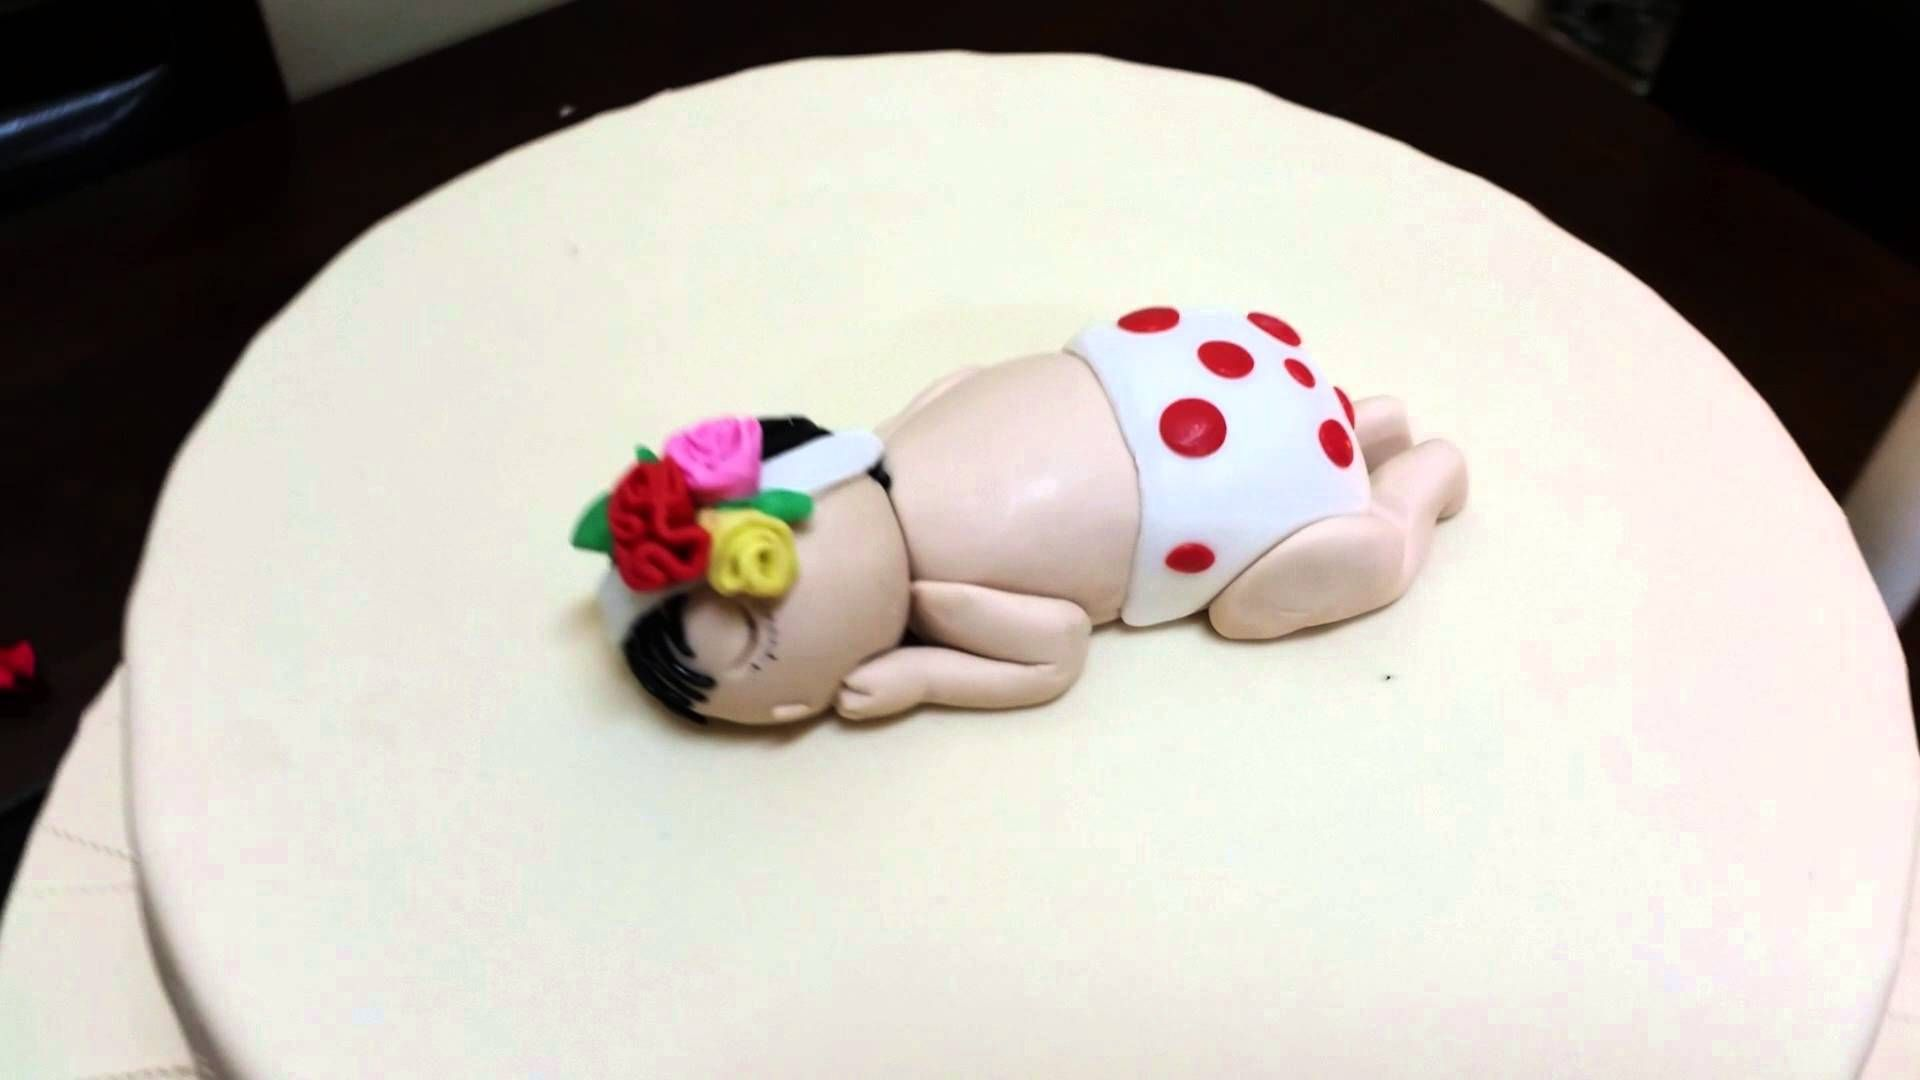 كيكة مولود جديد New Born Baby Cake Desserts Cake Food